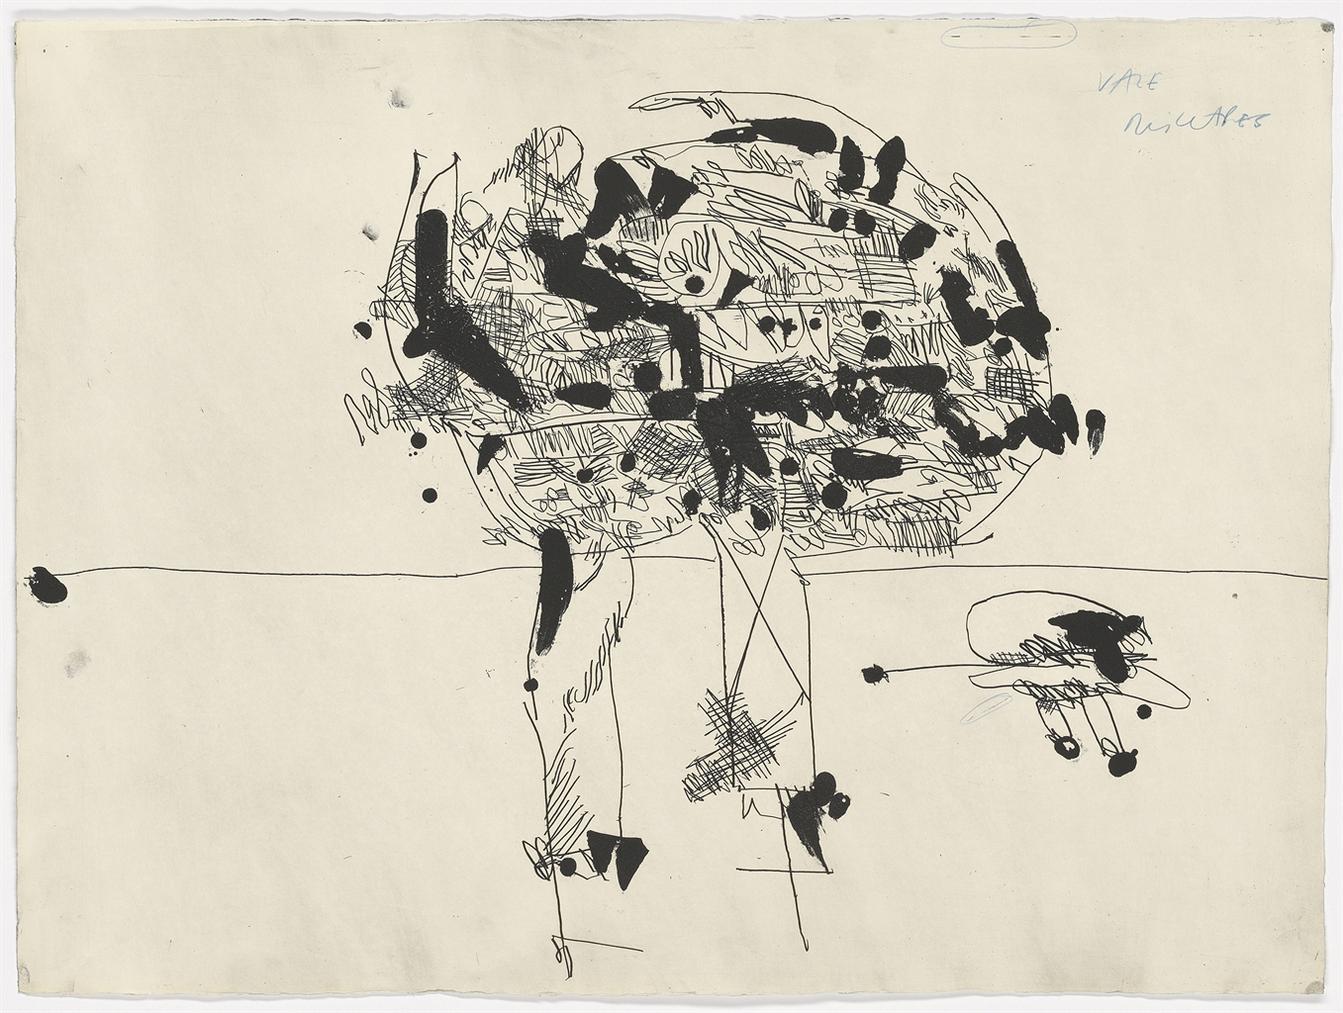 Manolo Millares-Antropofauna-1970